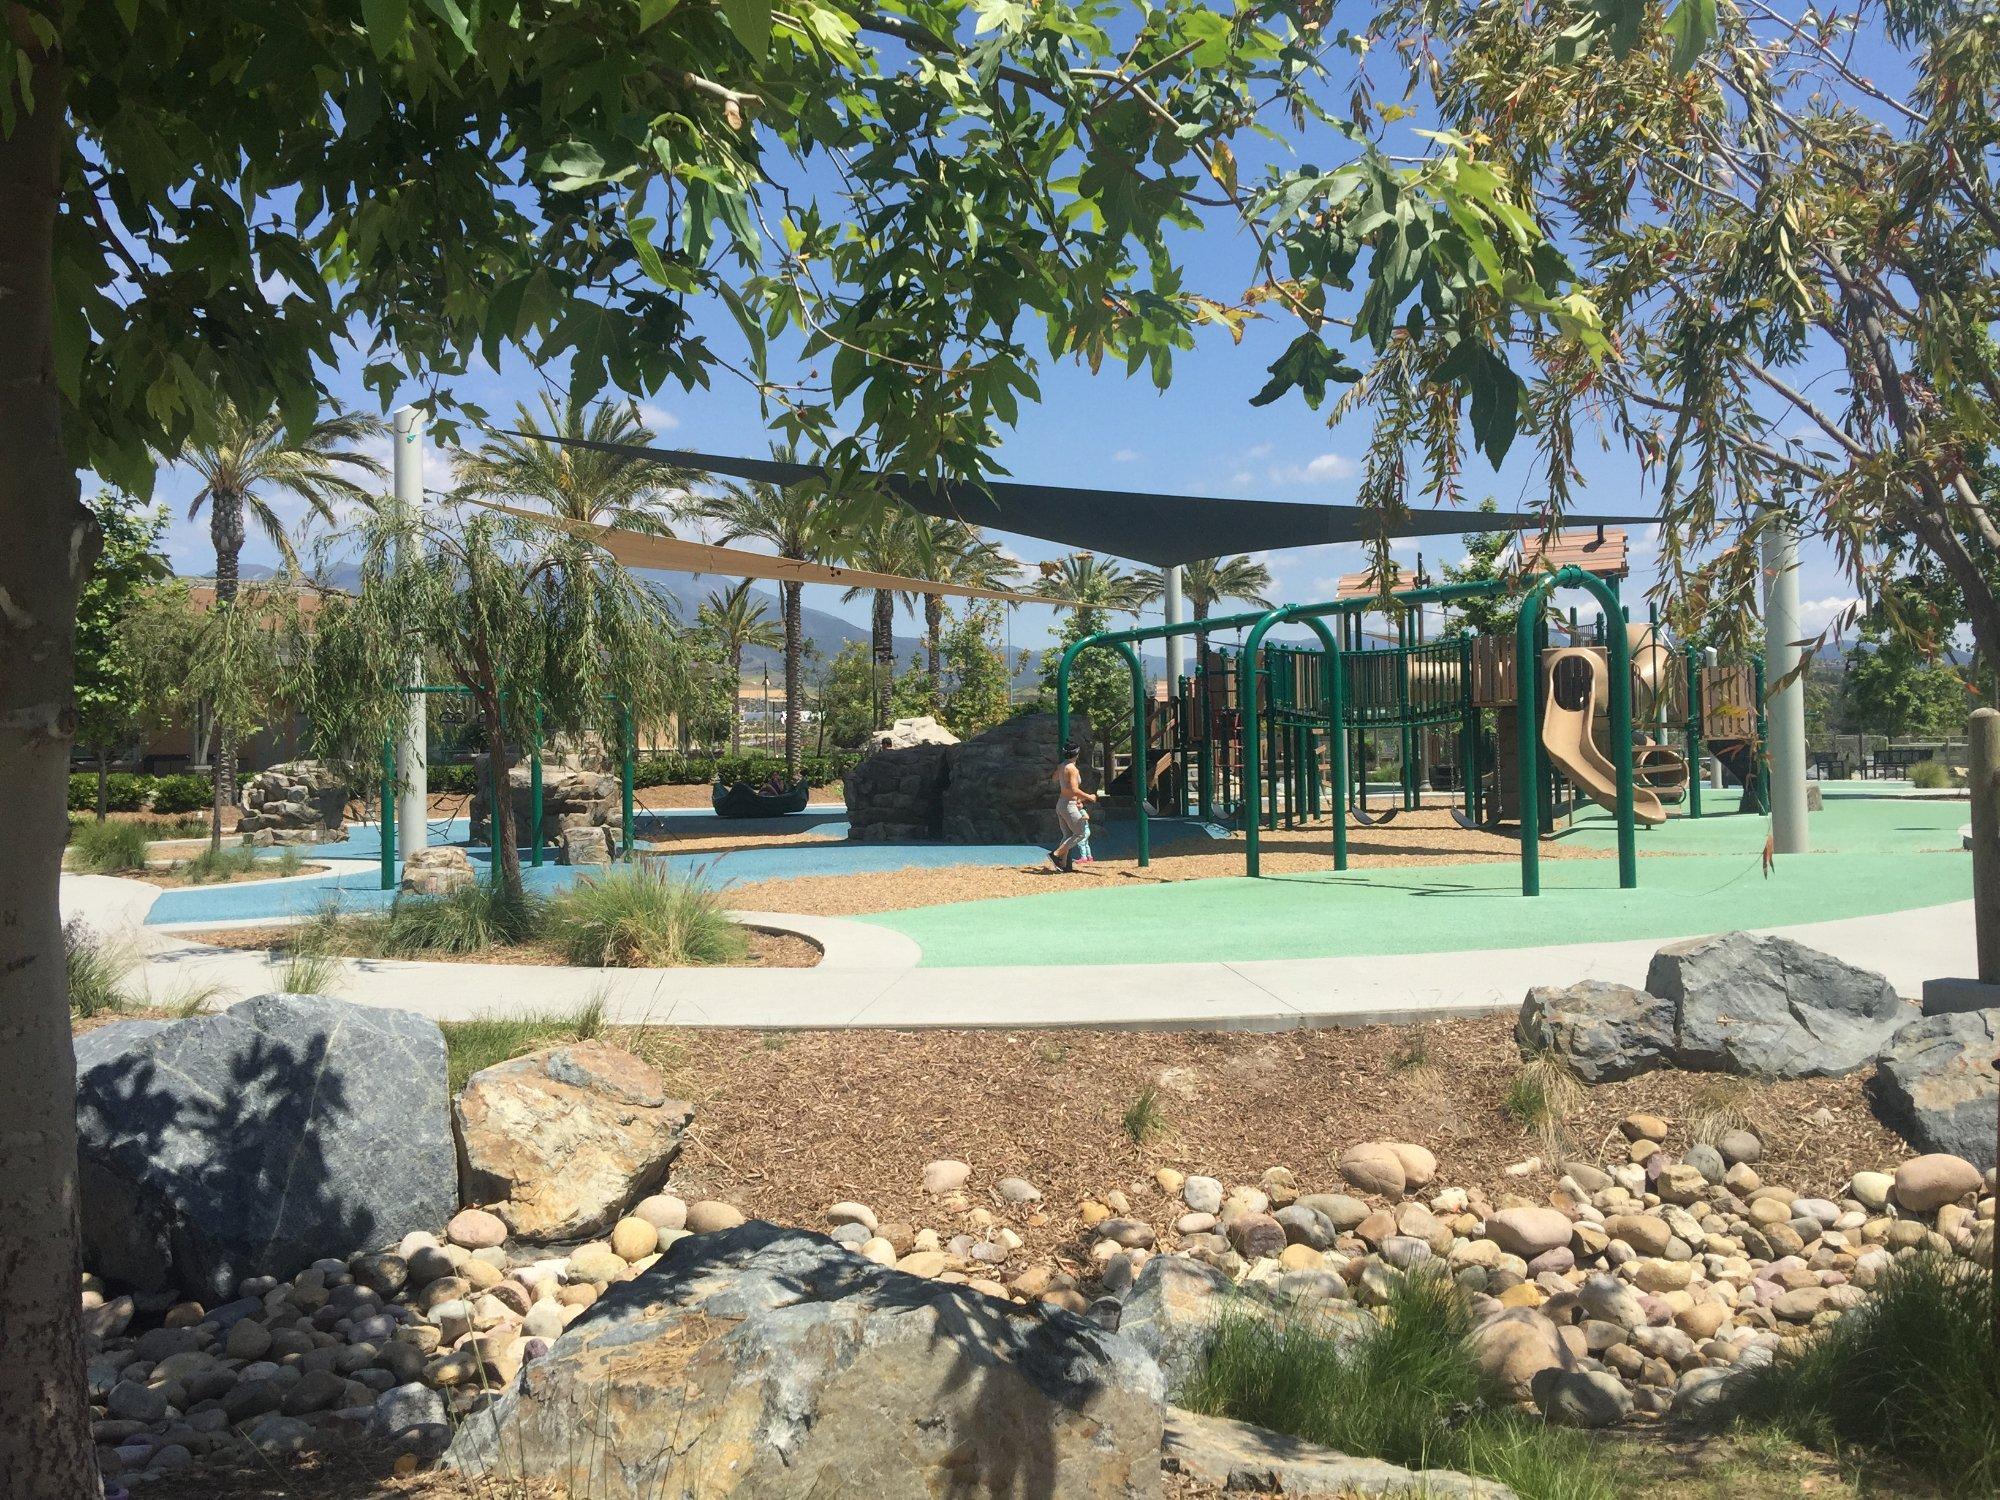 The Top 10 Things to Do Near Rancho Las Lomas Wildlife Foundation